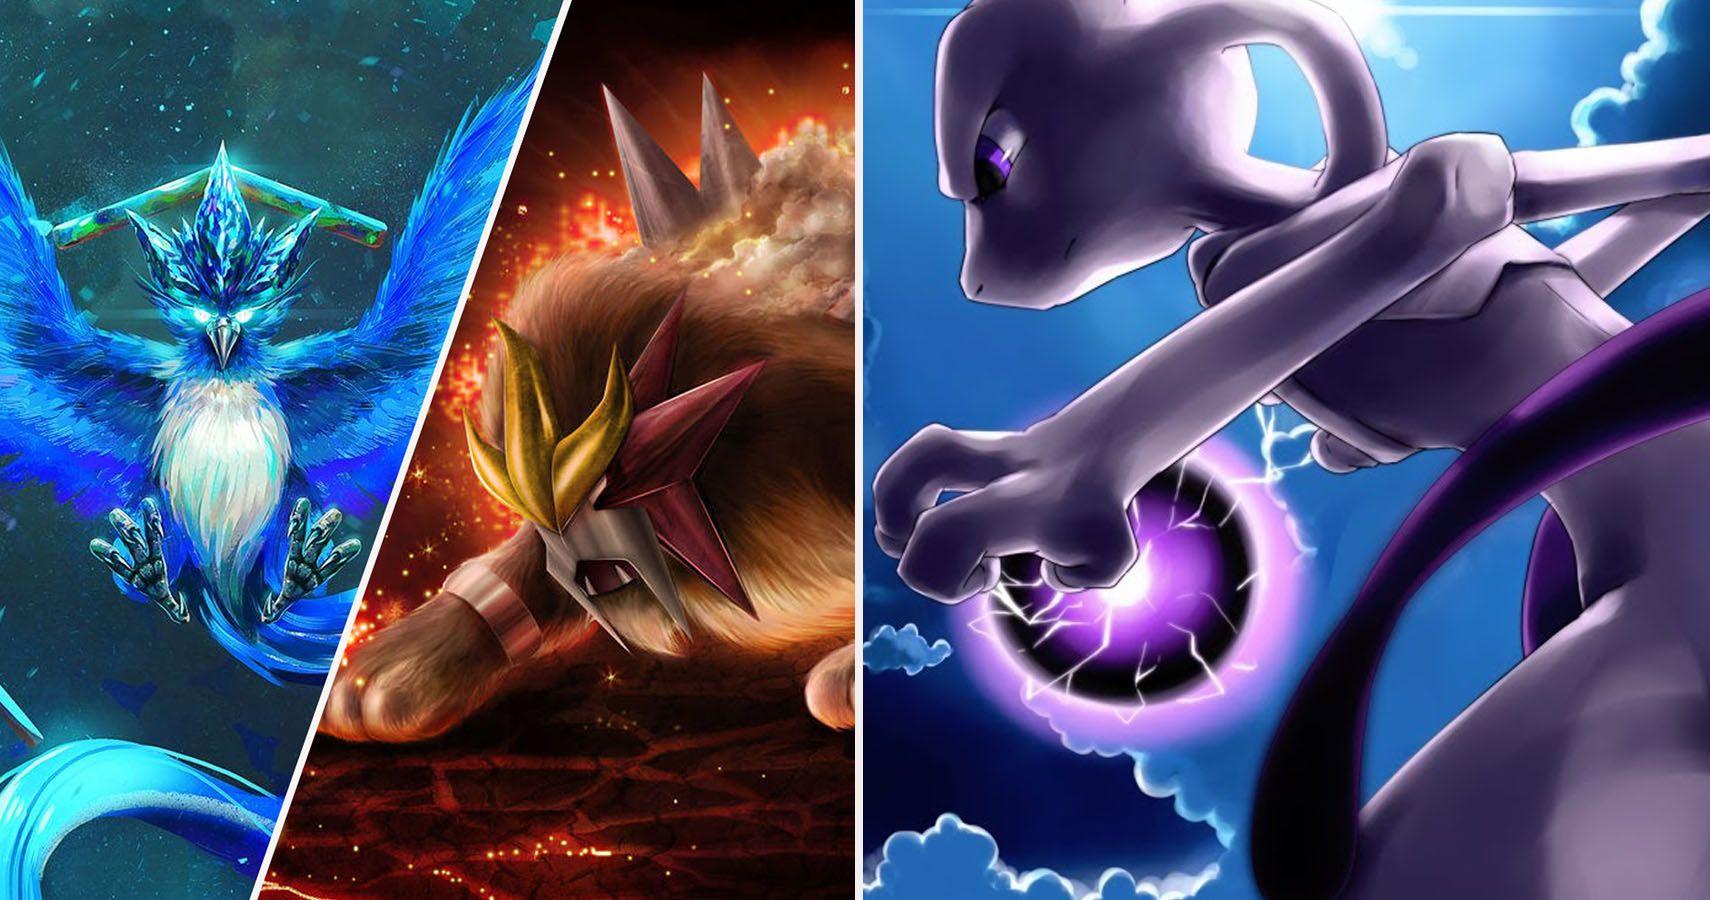 Pokémon Every Legendary From Weakest To Most Powerful